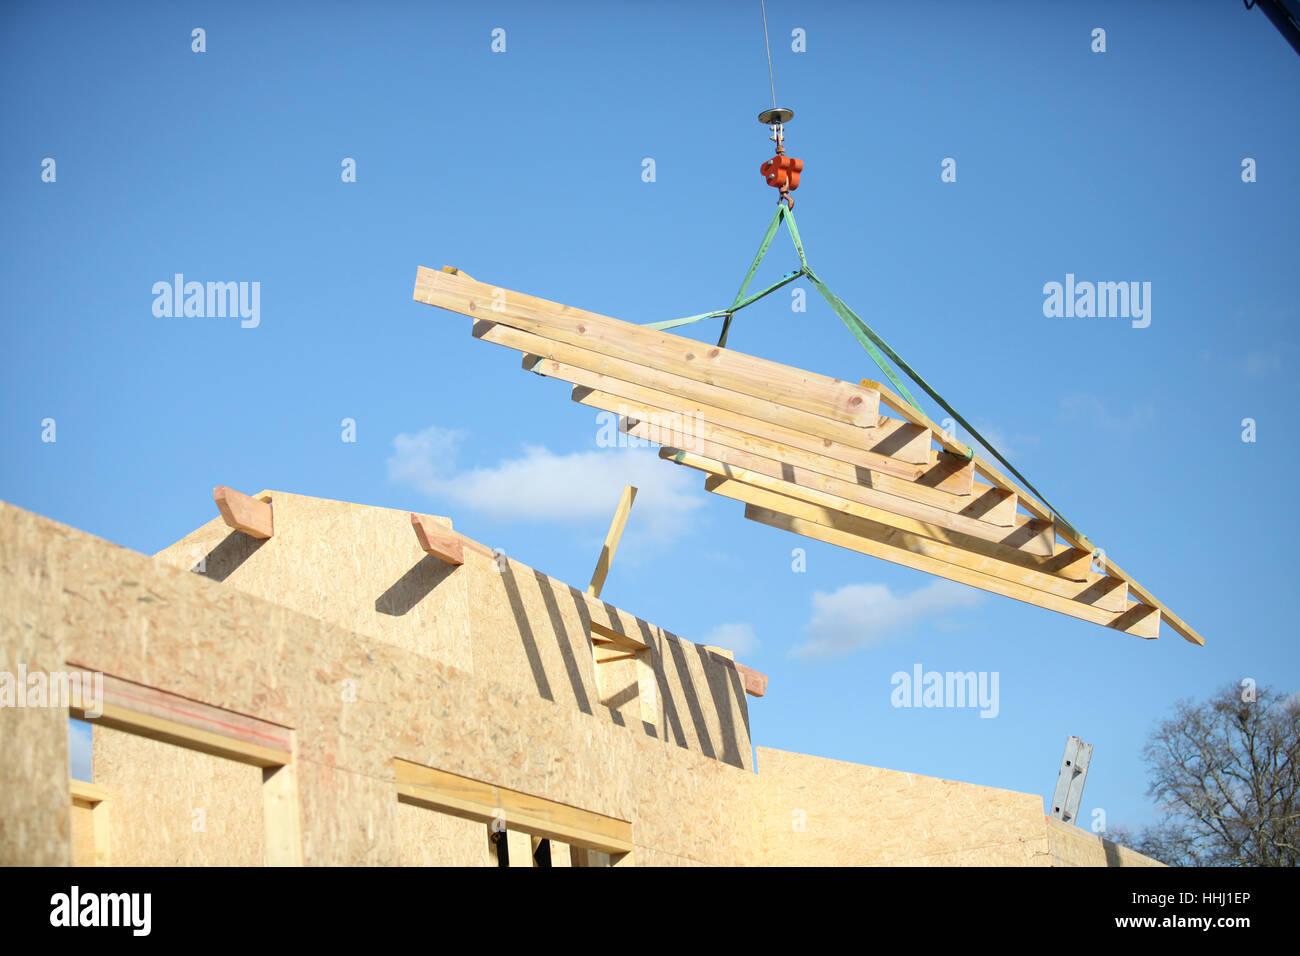 build, cord, construct, dangle, accommodation, construction, accomodation, - Stock Image